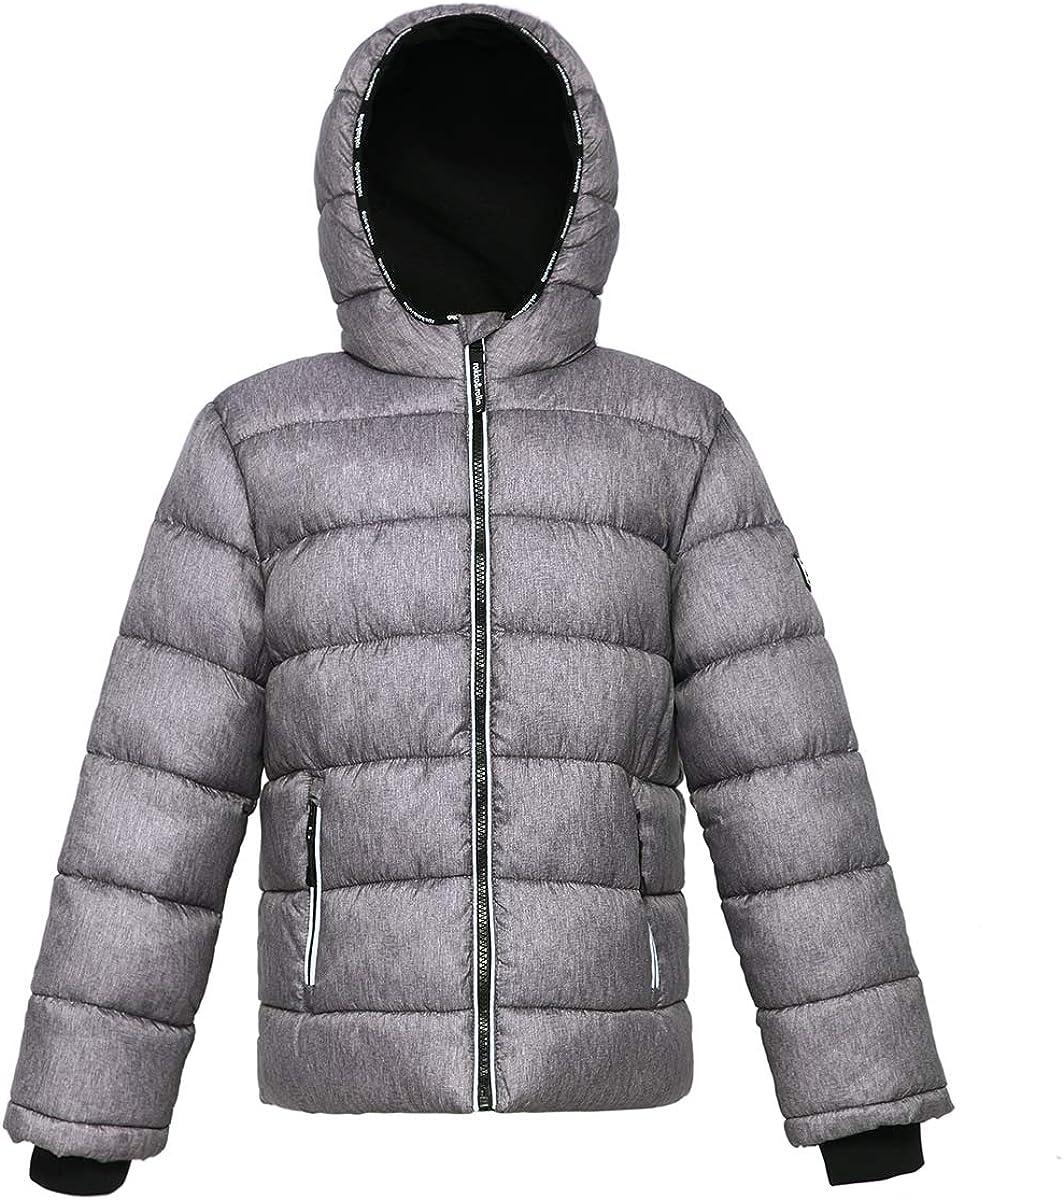 Rokka&Rolla Boys' Heavyweight Water-Resistant Fleece Lined Puffer Jacket Bubble Coat: Clothing